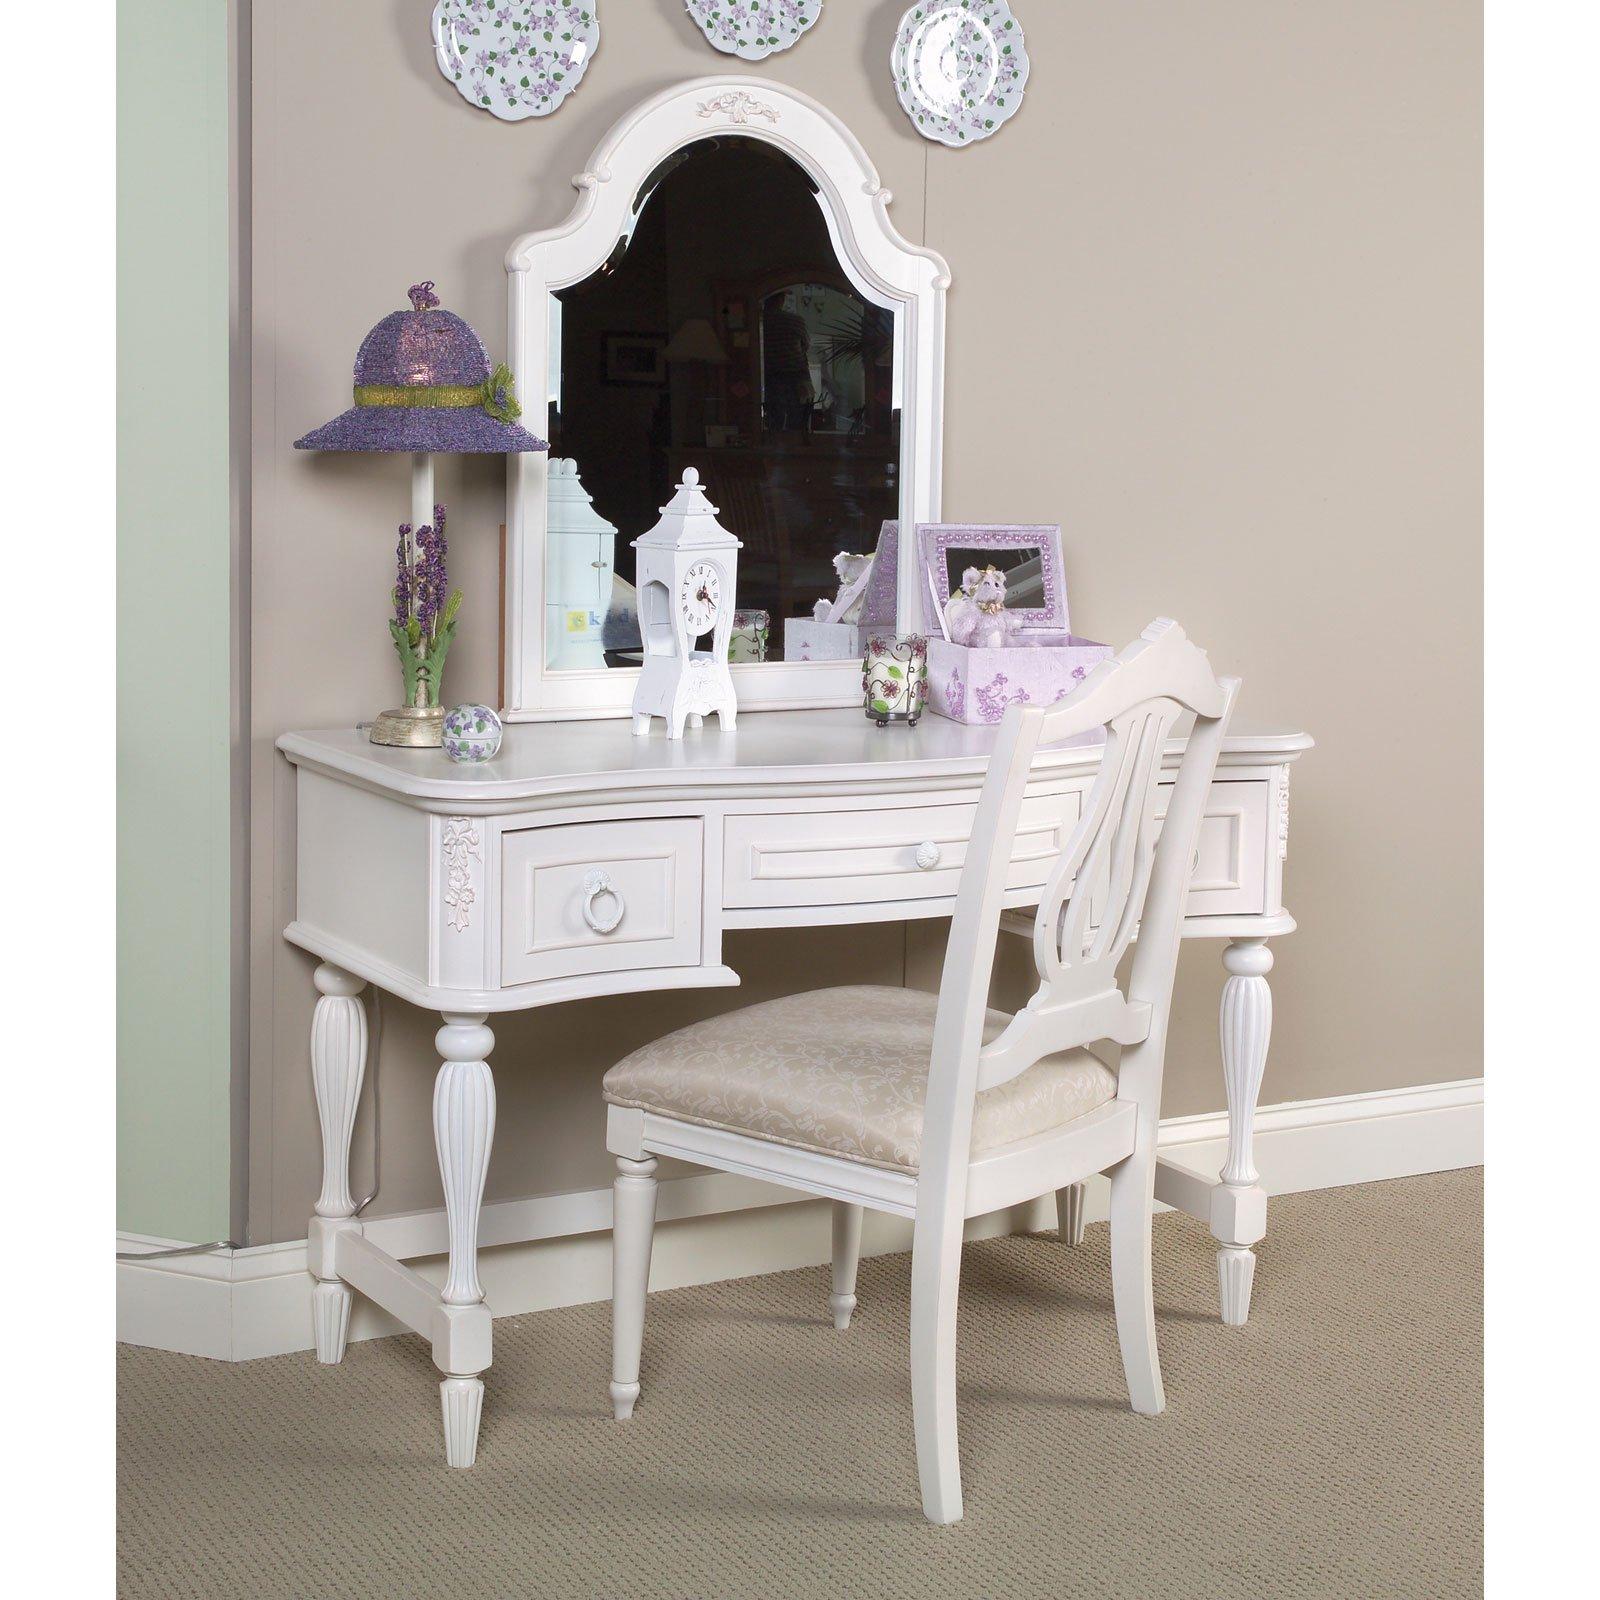 purple makeup vanity chair full body shiatsu massage recliner luxury bedroom future dream house design